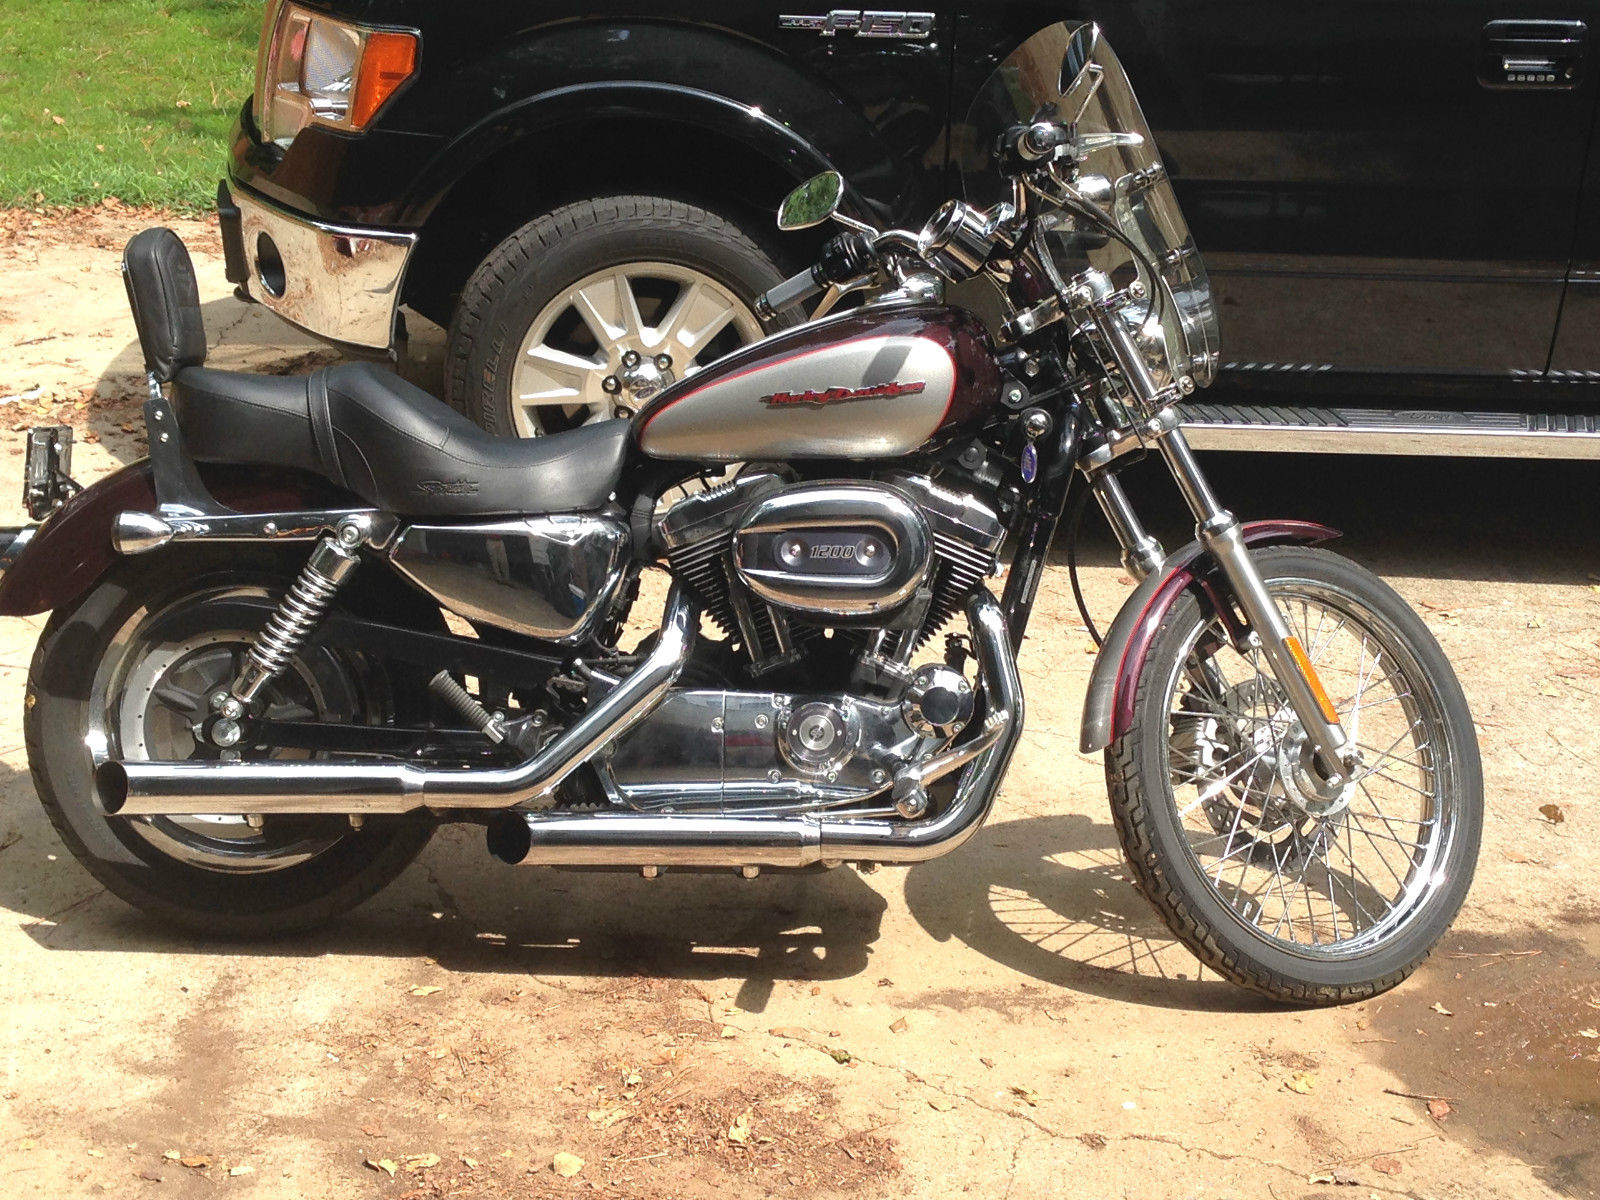 2007 Harley Davidson Sportster 1200 Custom Black Cherry Silver